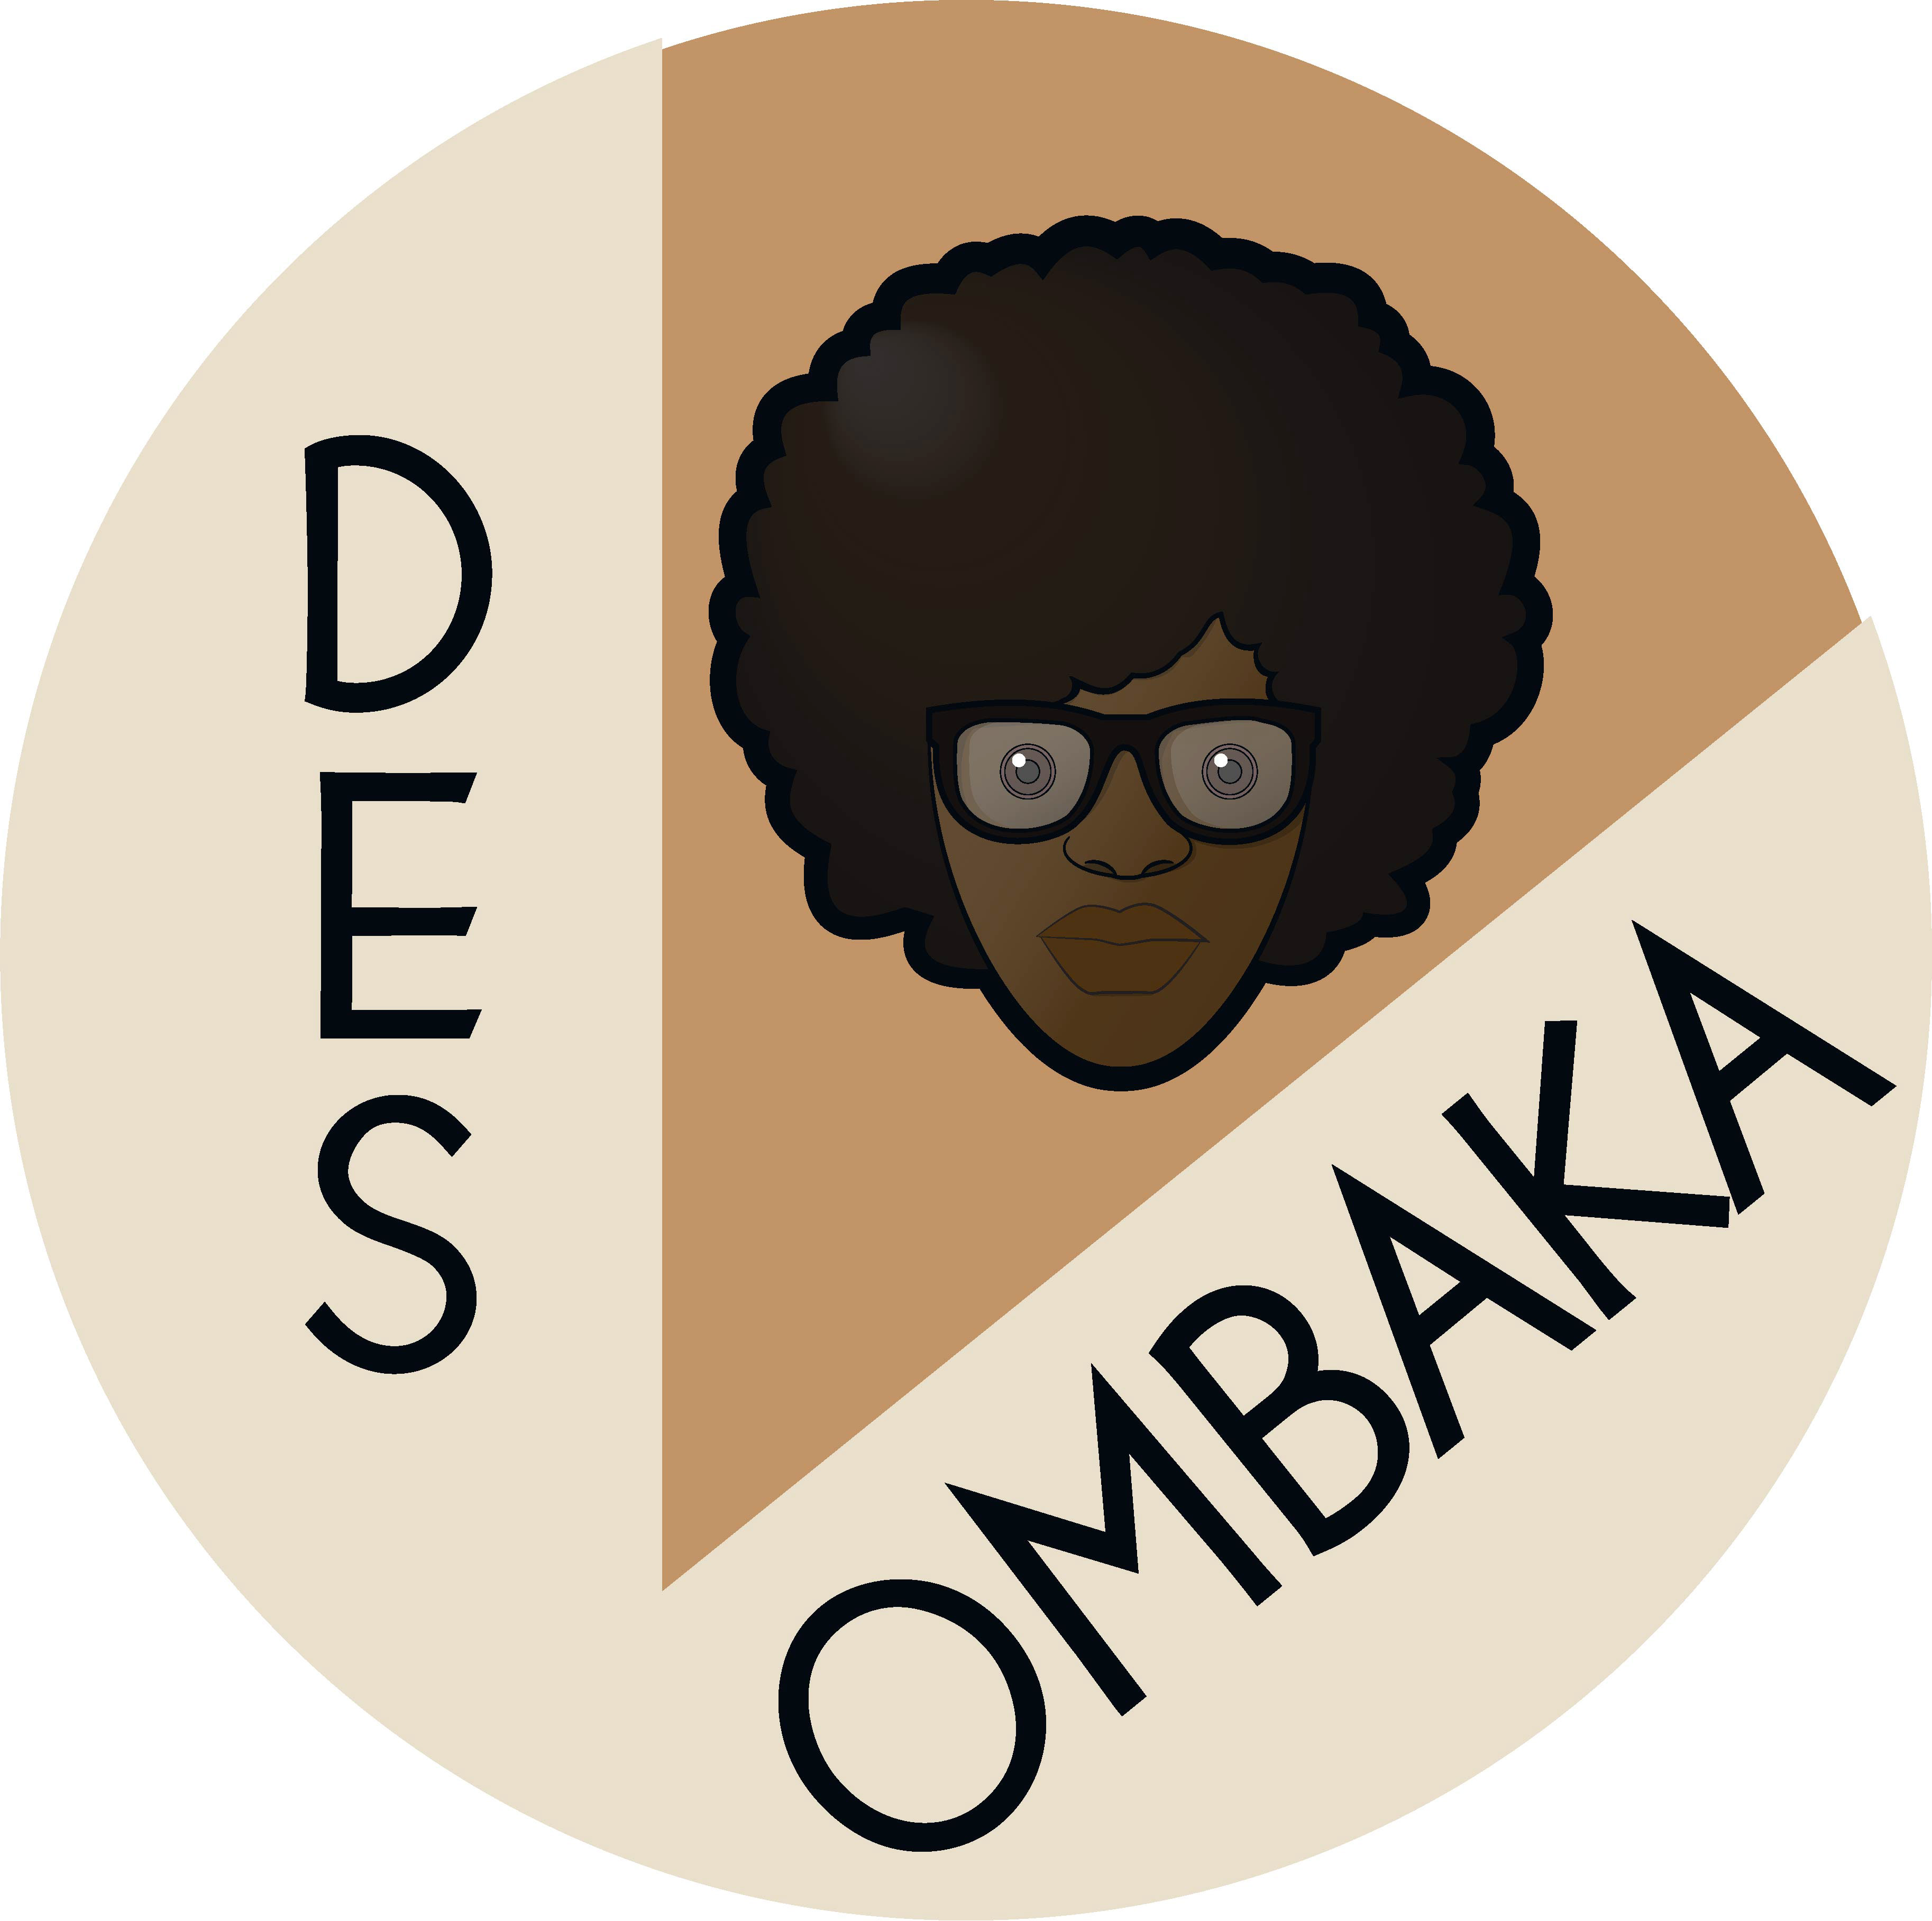 Des Ombaka